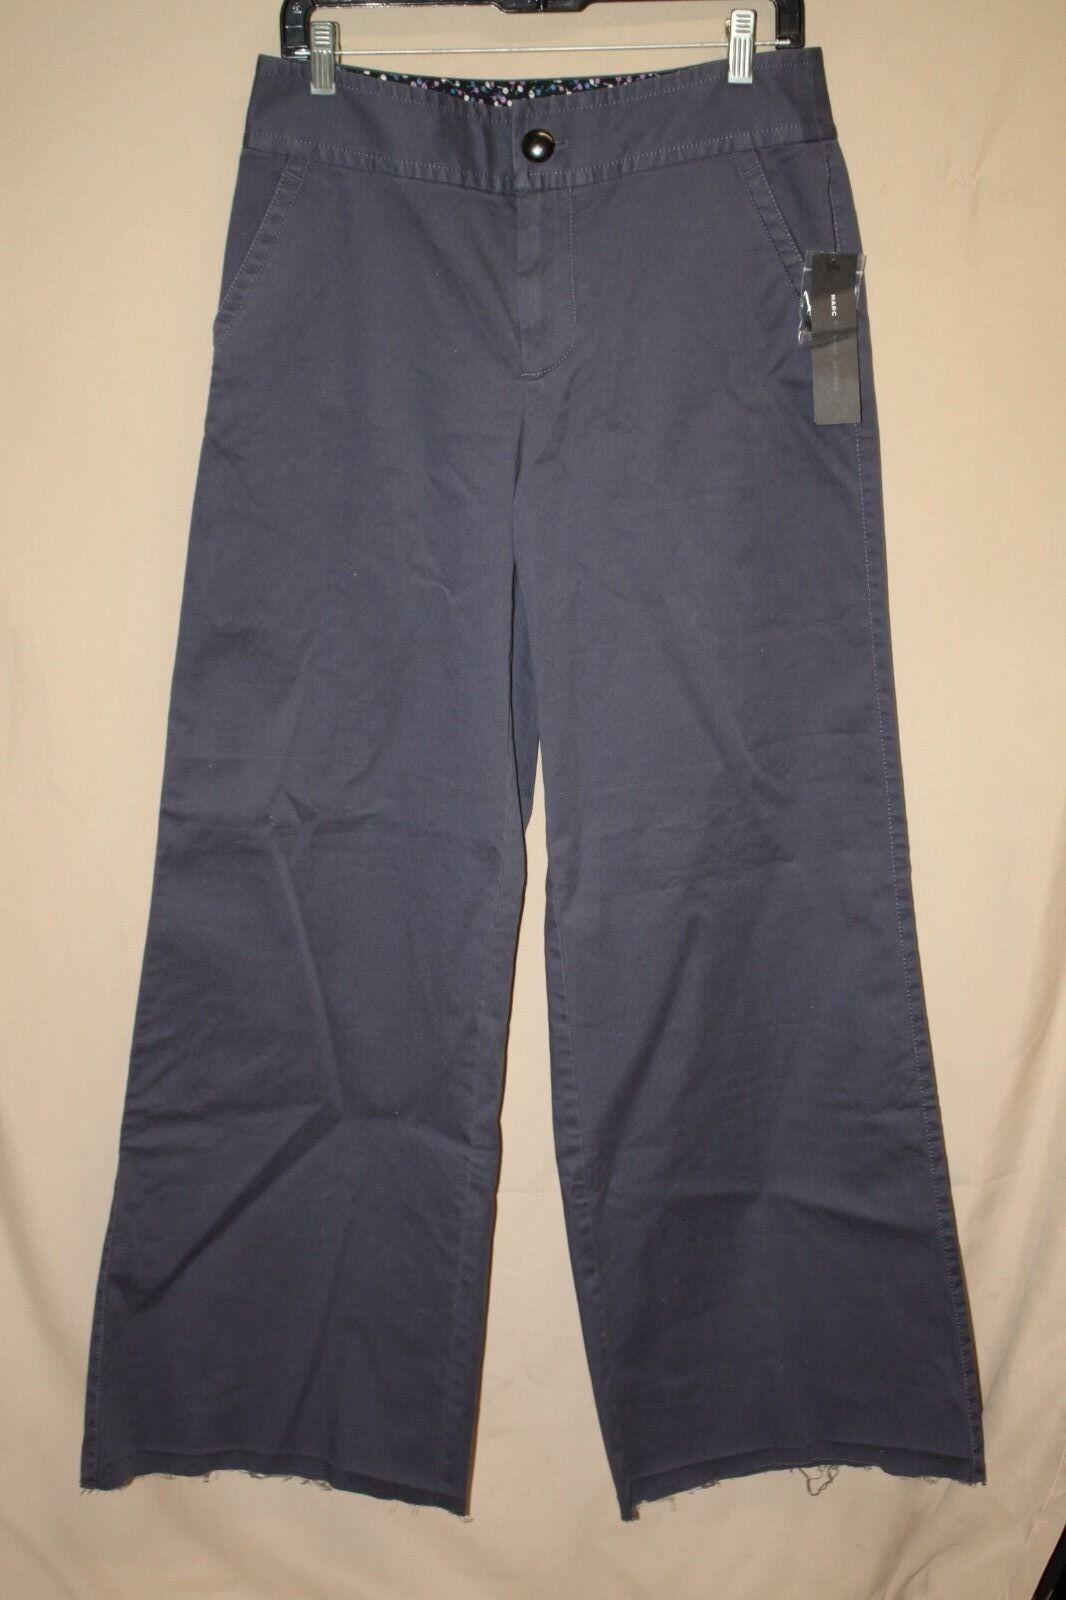 Marc Jacobs MJ damen Dress Work Pants Größe 6 NWT